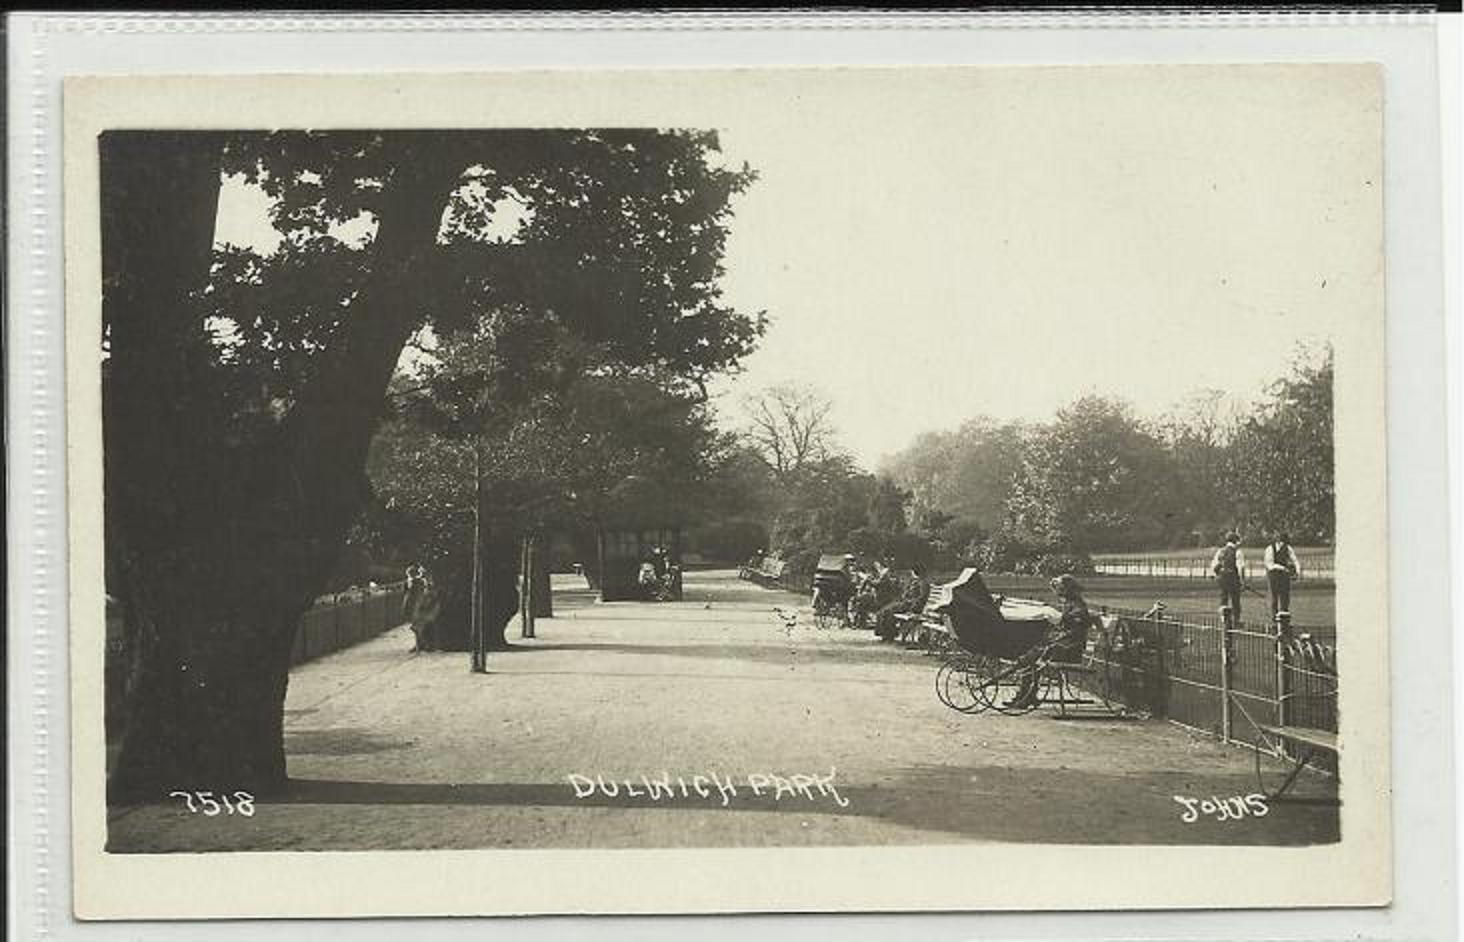 dulwich-park-prams